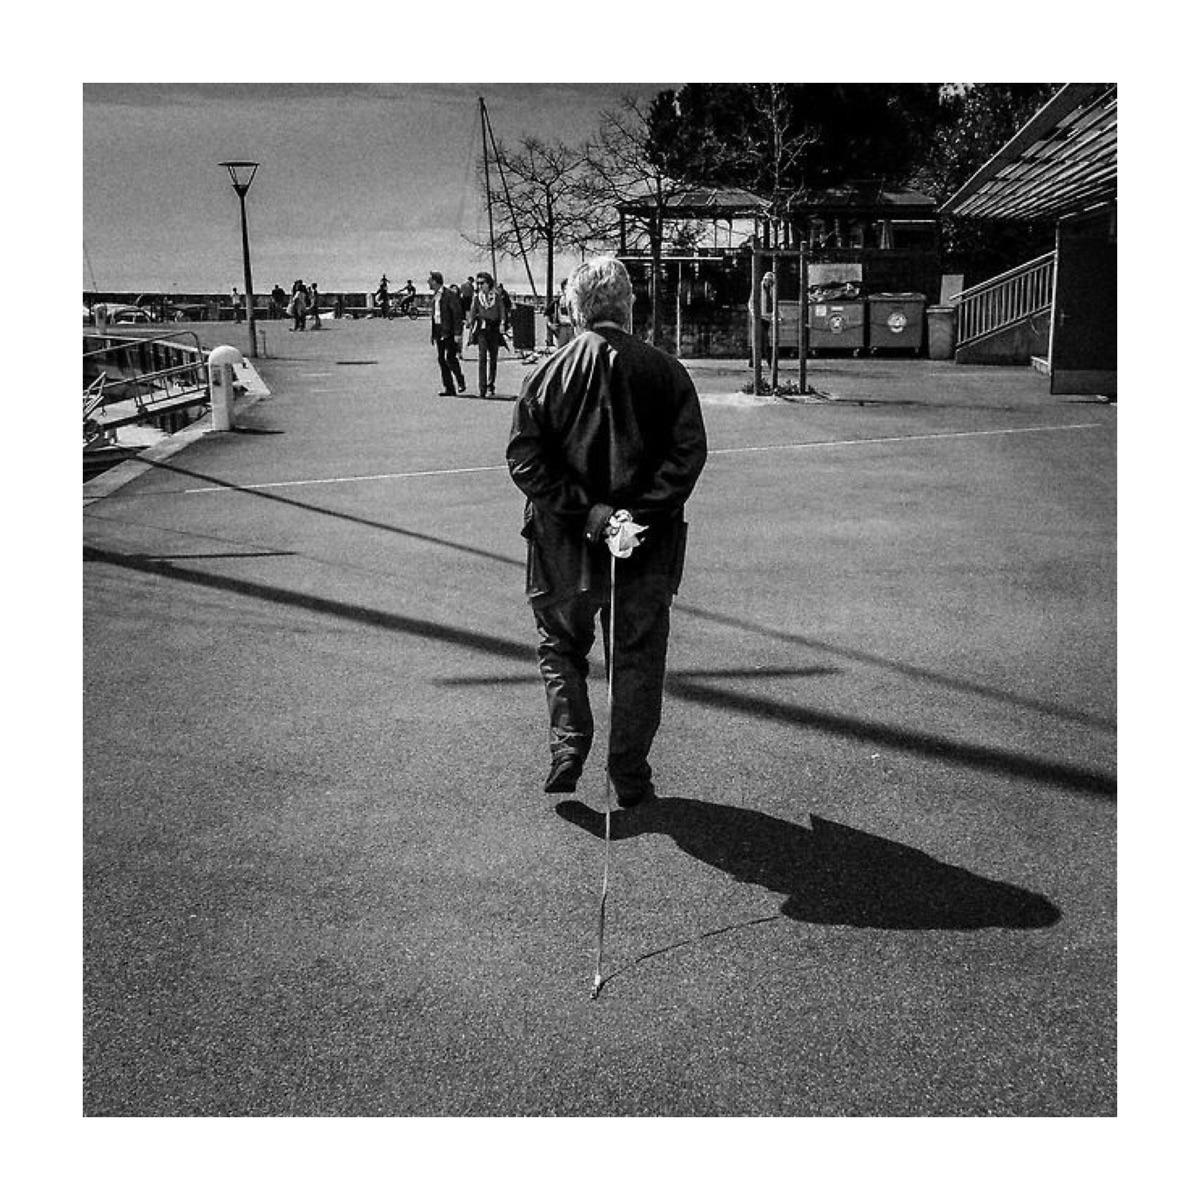 SOLITUDE / LONELINESS Lutry (CH - pascalbernheim | ello